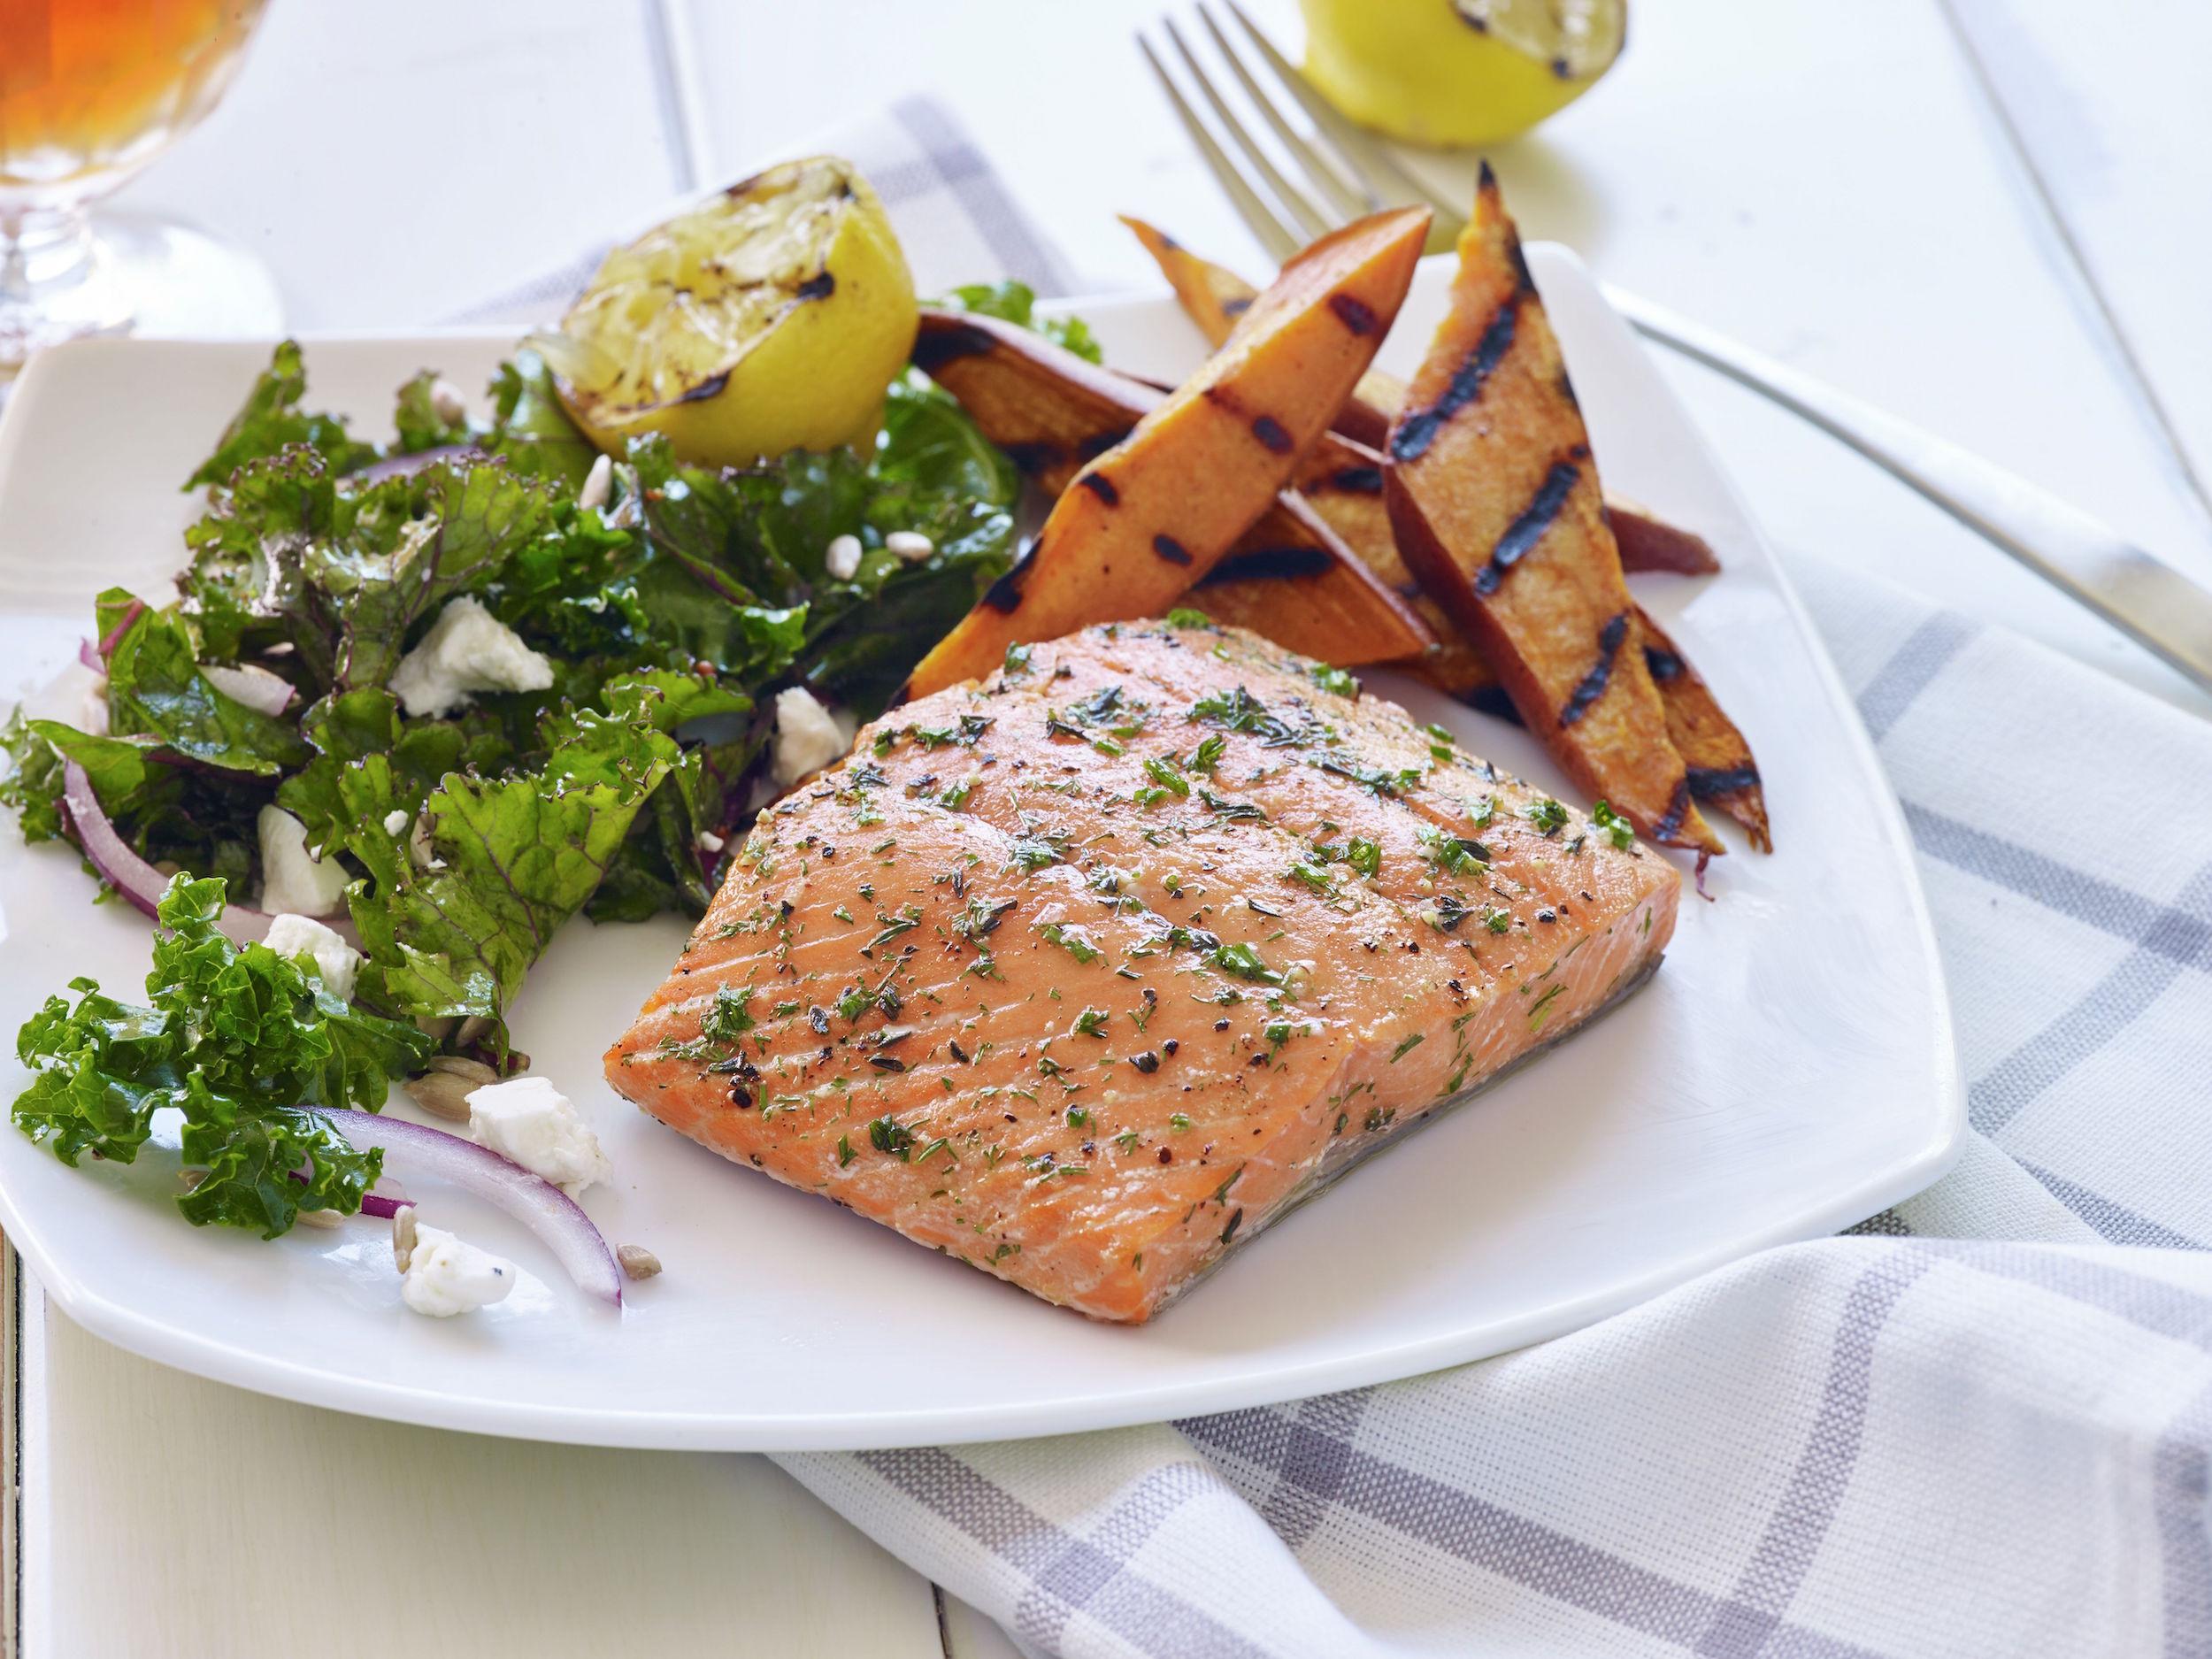 cedar-plank-alaska-salmon-with-roasted-sweet-potatoes